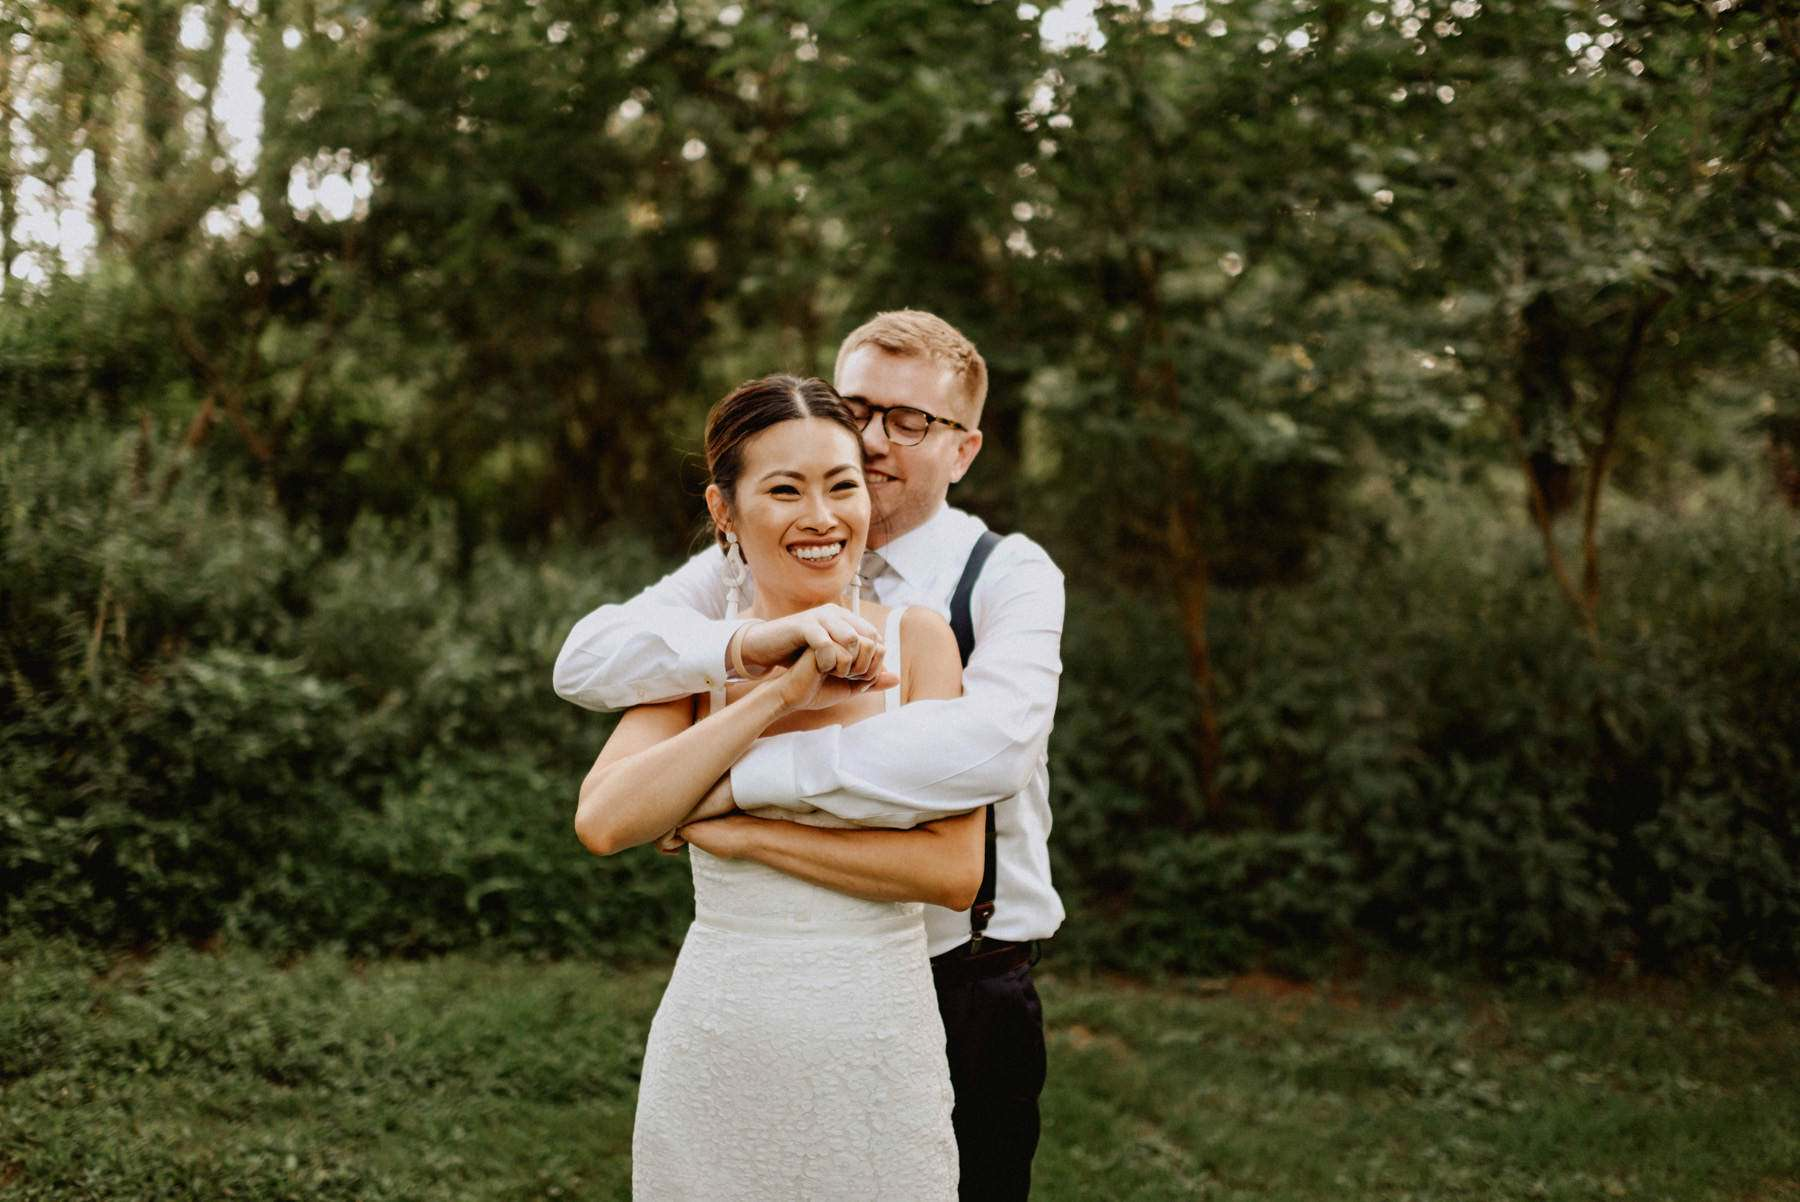 Appleford-estate-wedding-138.jpg